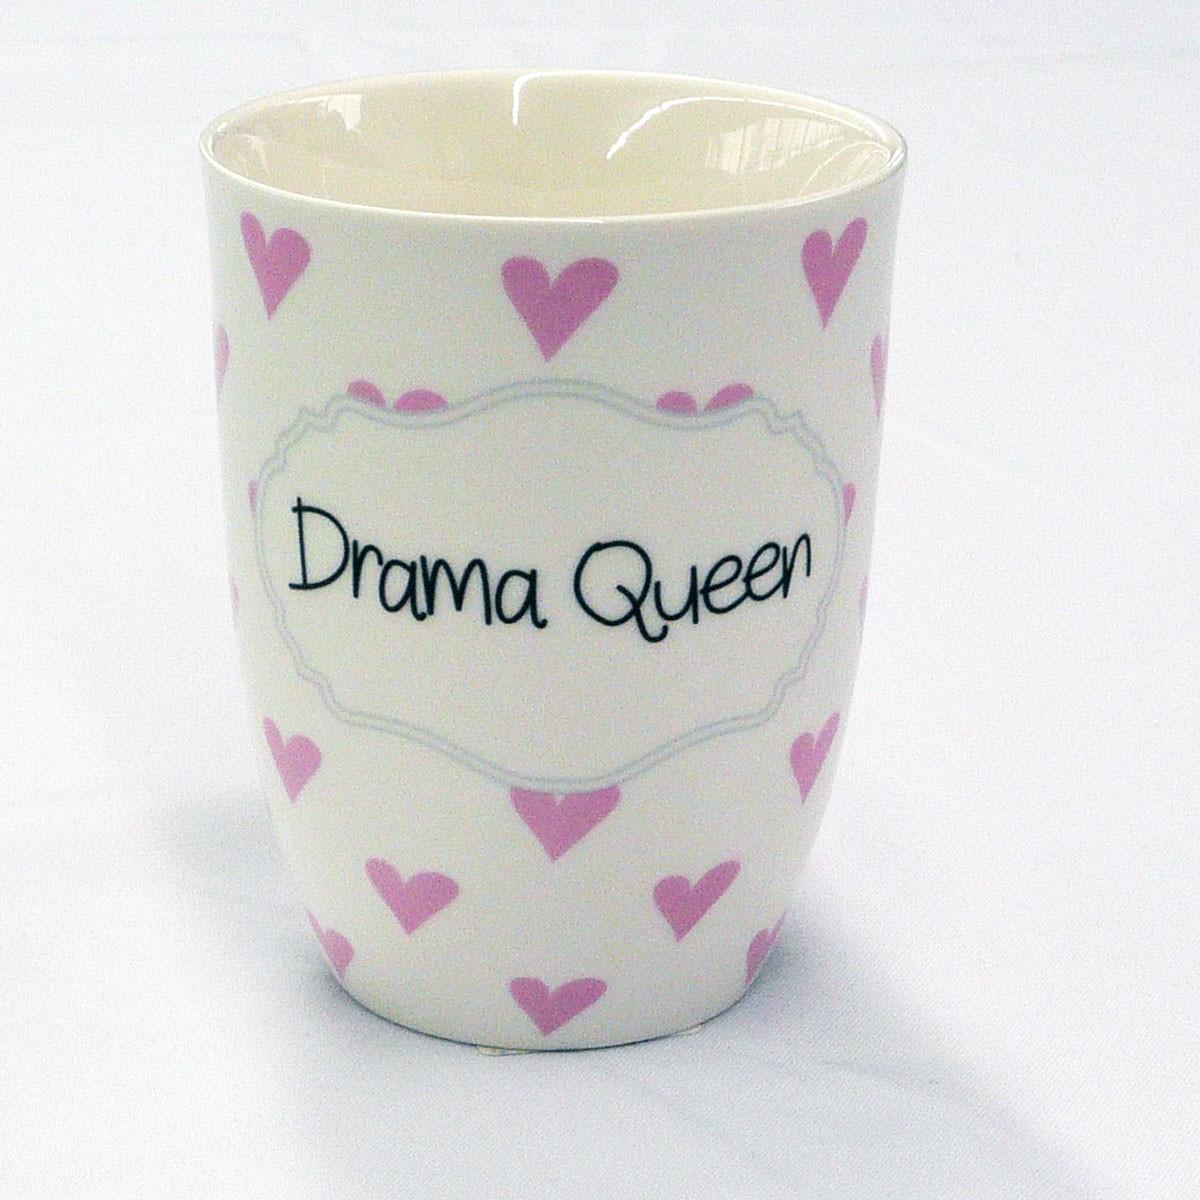 mea living kaffee tasse becher mit spruch drama queen rosa herzen ebay. Black Bedroom Furniture Sets. Home Design Ideas